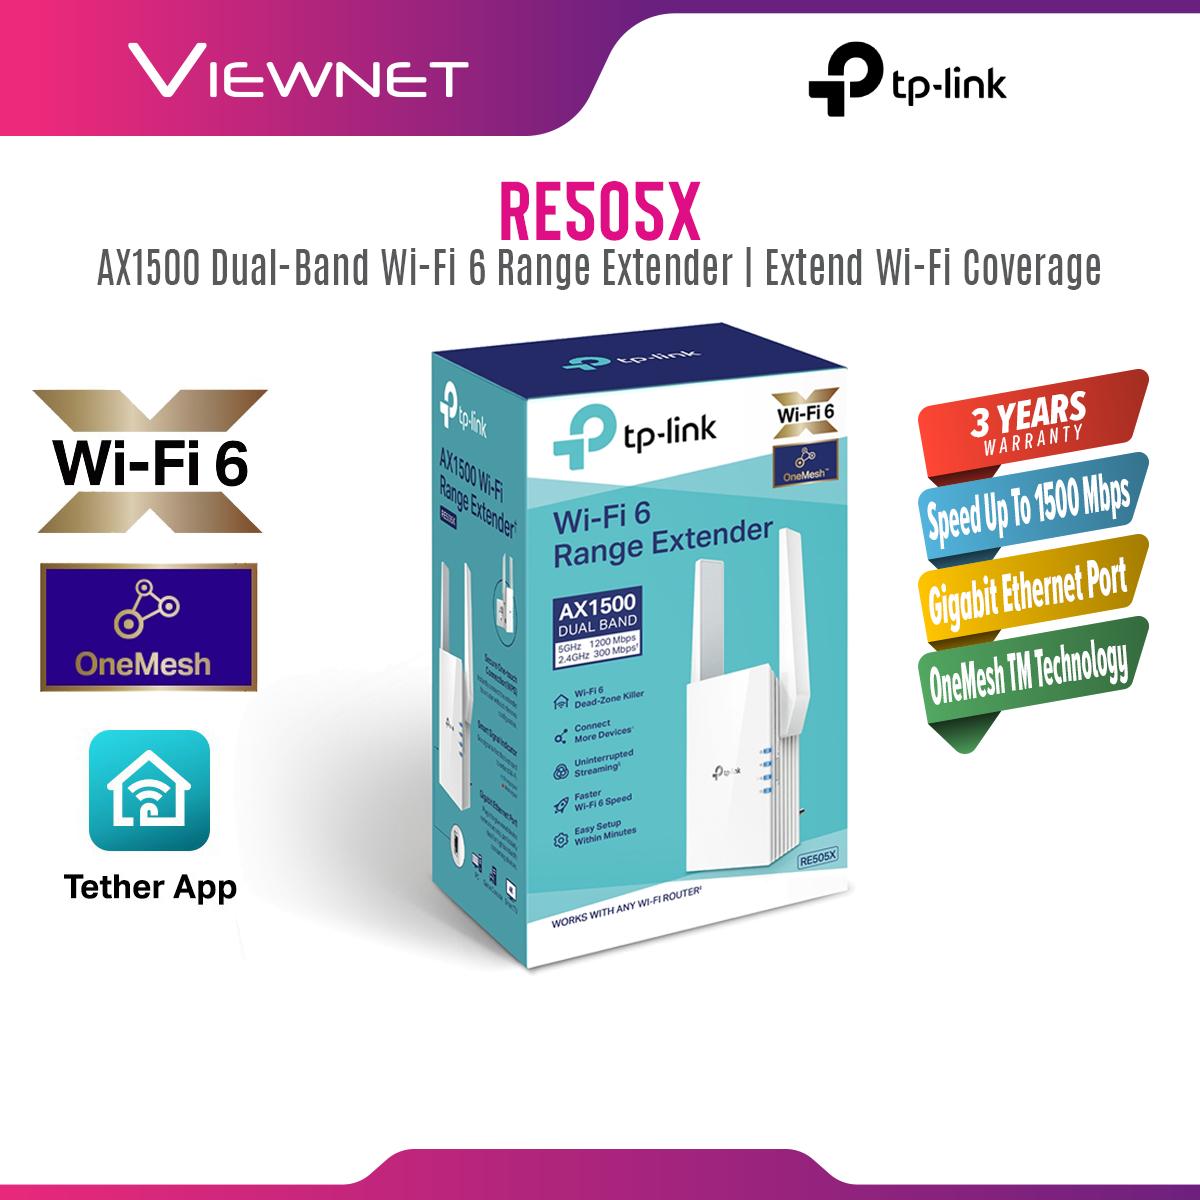 TP-Link RE505X - TP Link Wi-Fi 6 AX1500 Range Extender RE505X